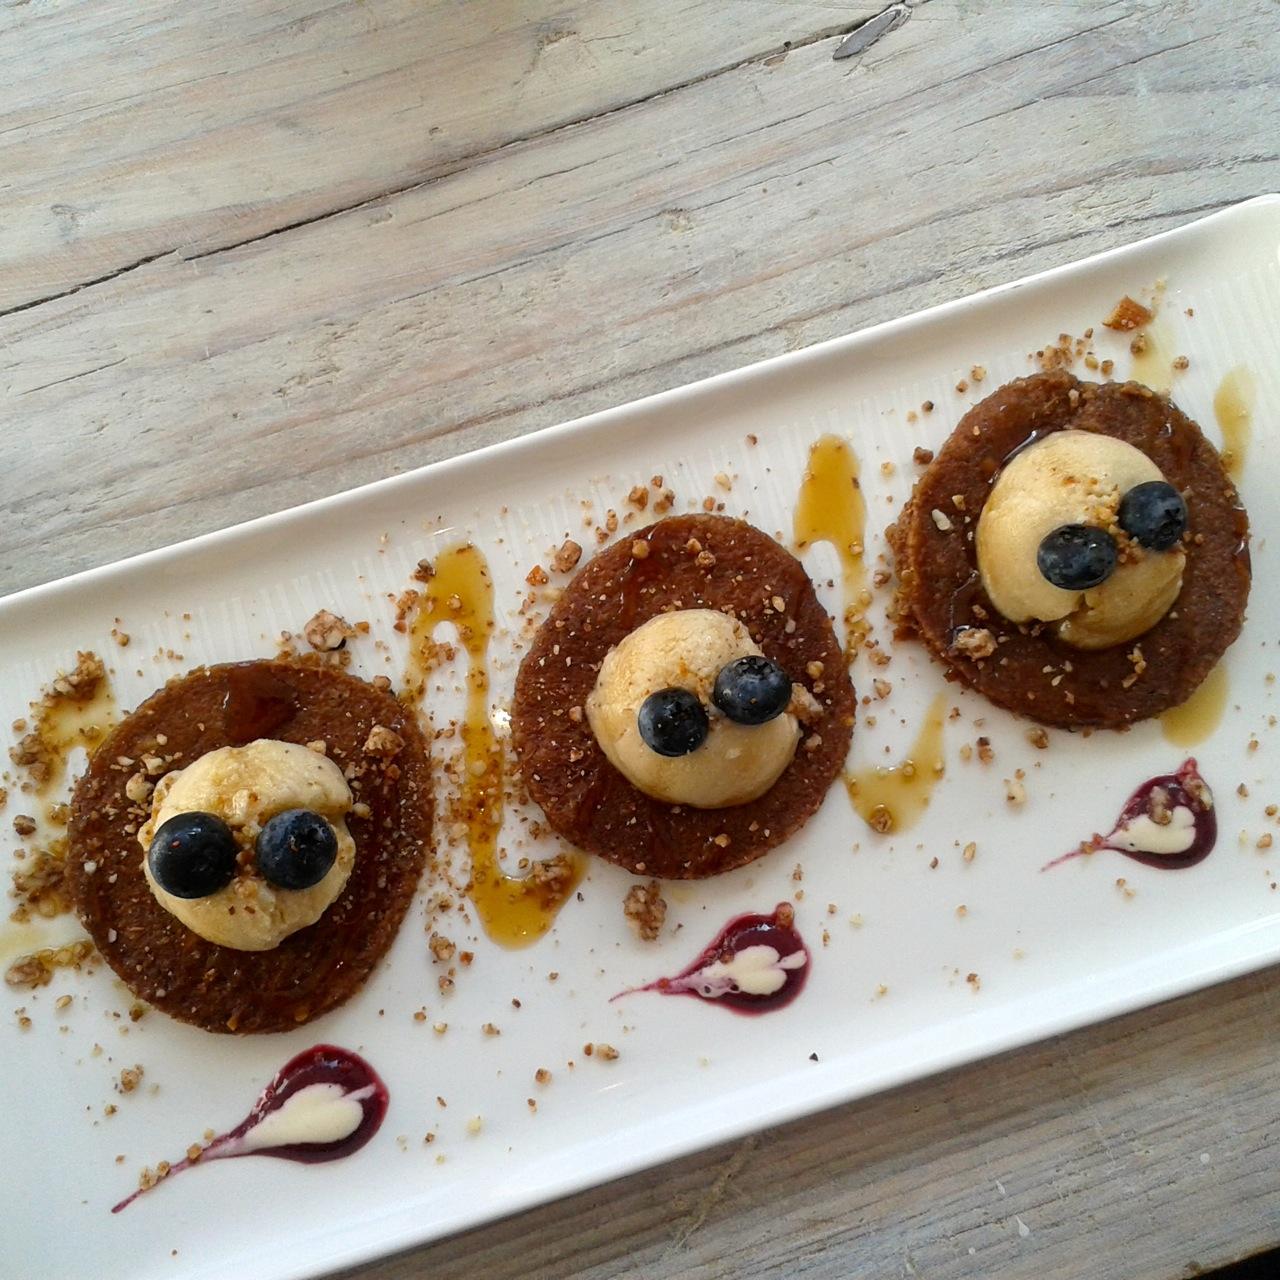 http://i1.wp.com/fatgayvegan.com/wp-content/uploads/2014/09/pancakes.jpg?fit=1280%2C1280